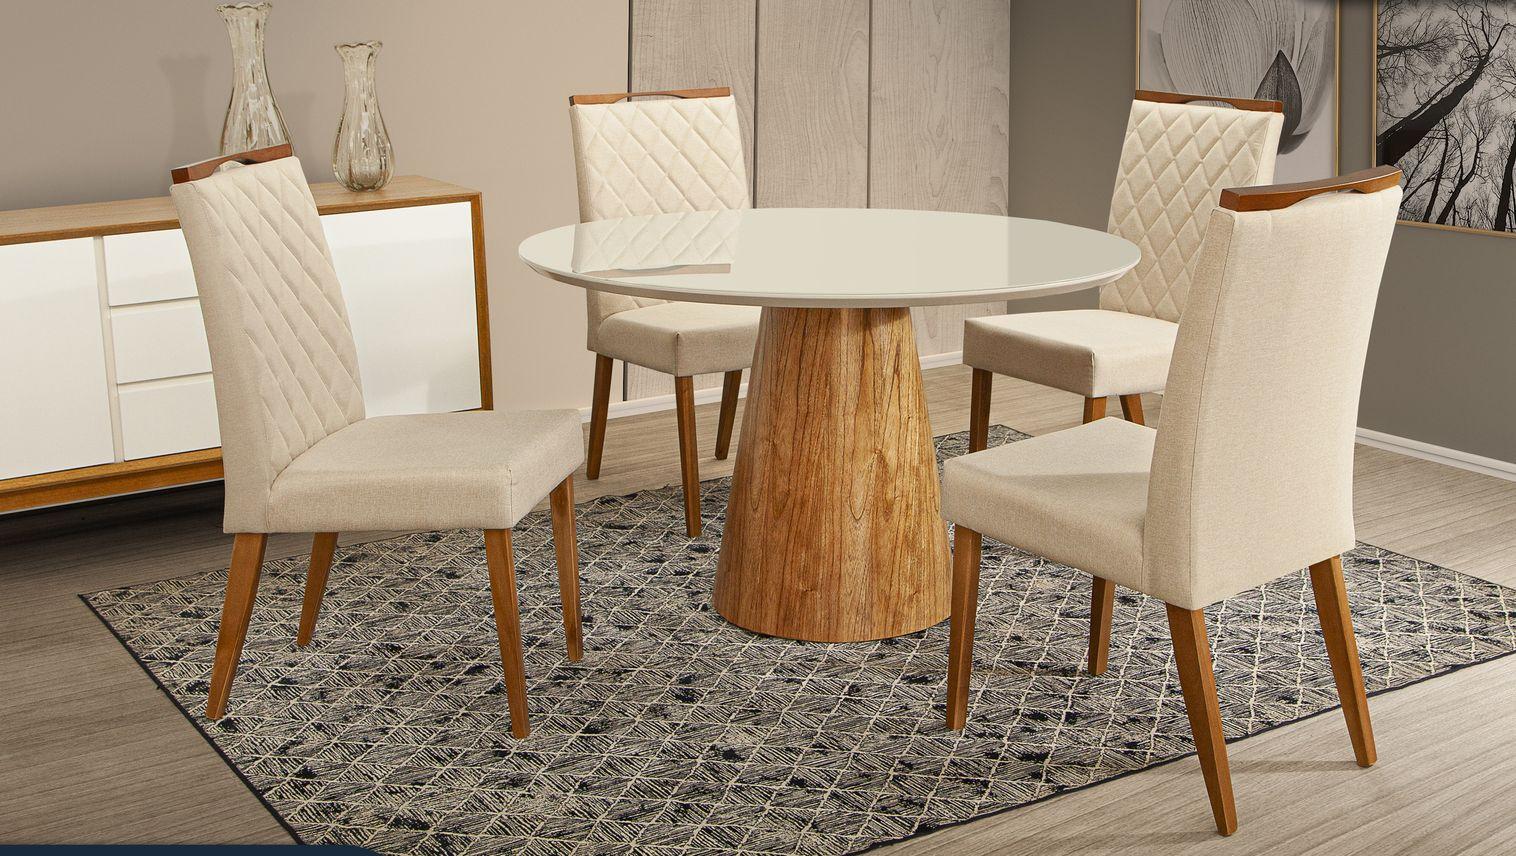 Kit 2 Cadeira de Jantar Estofada para sua Mesa Roma Mozzoni